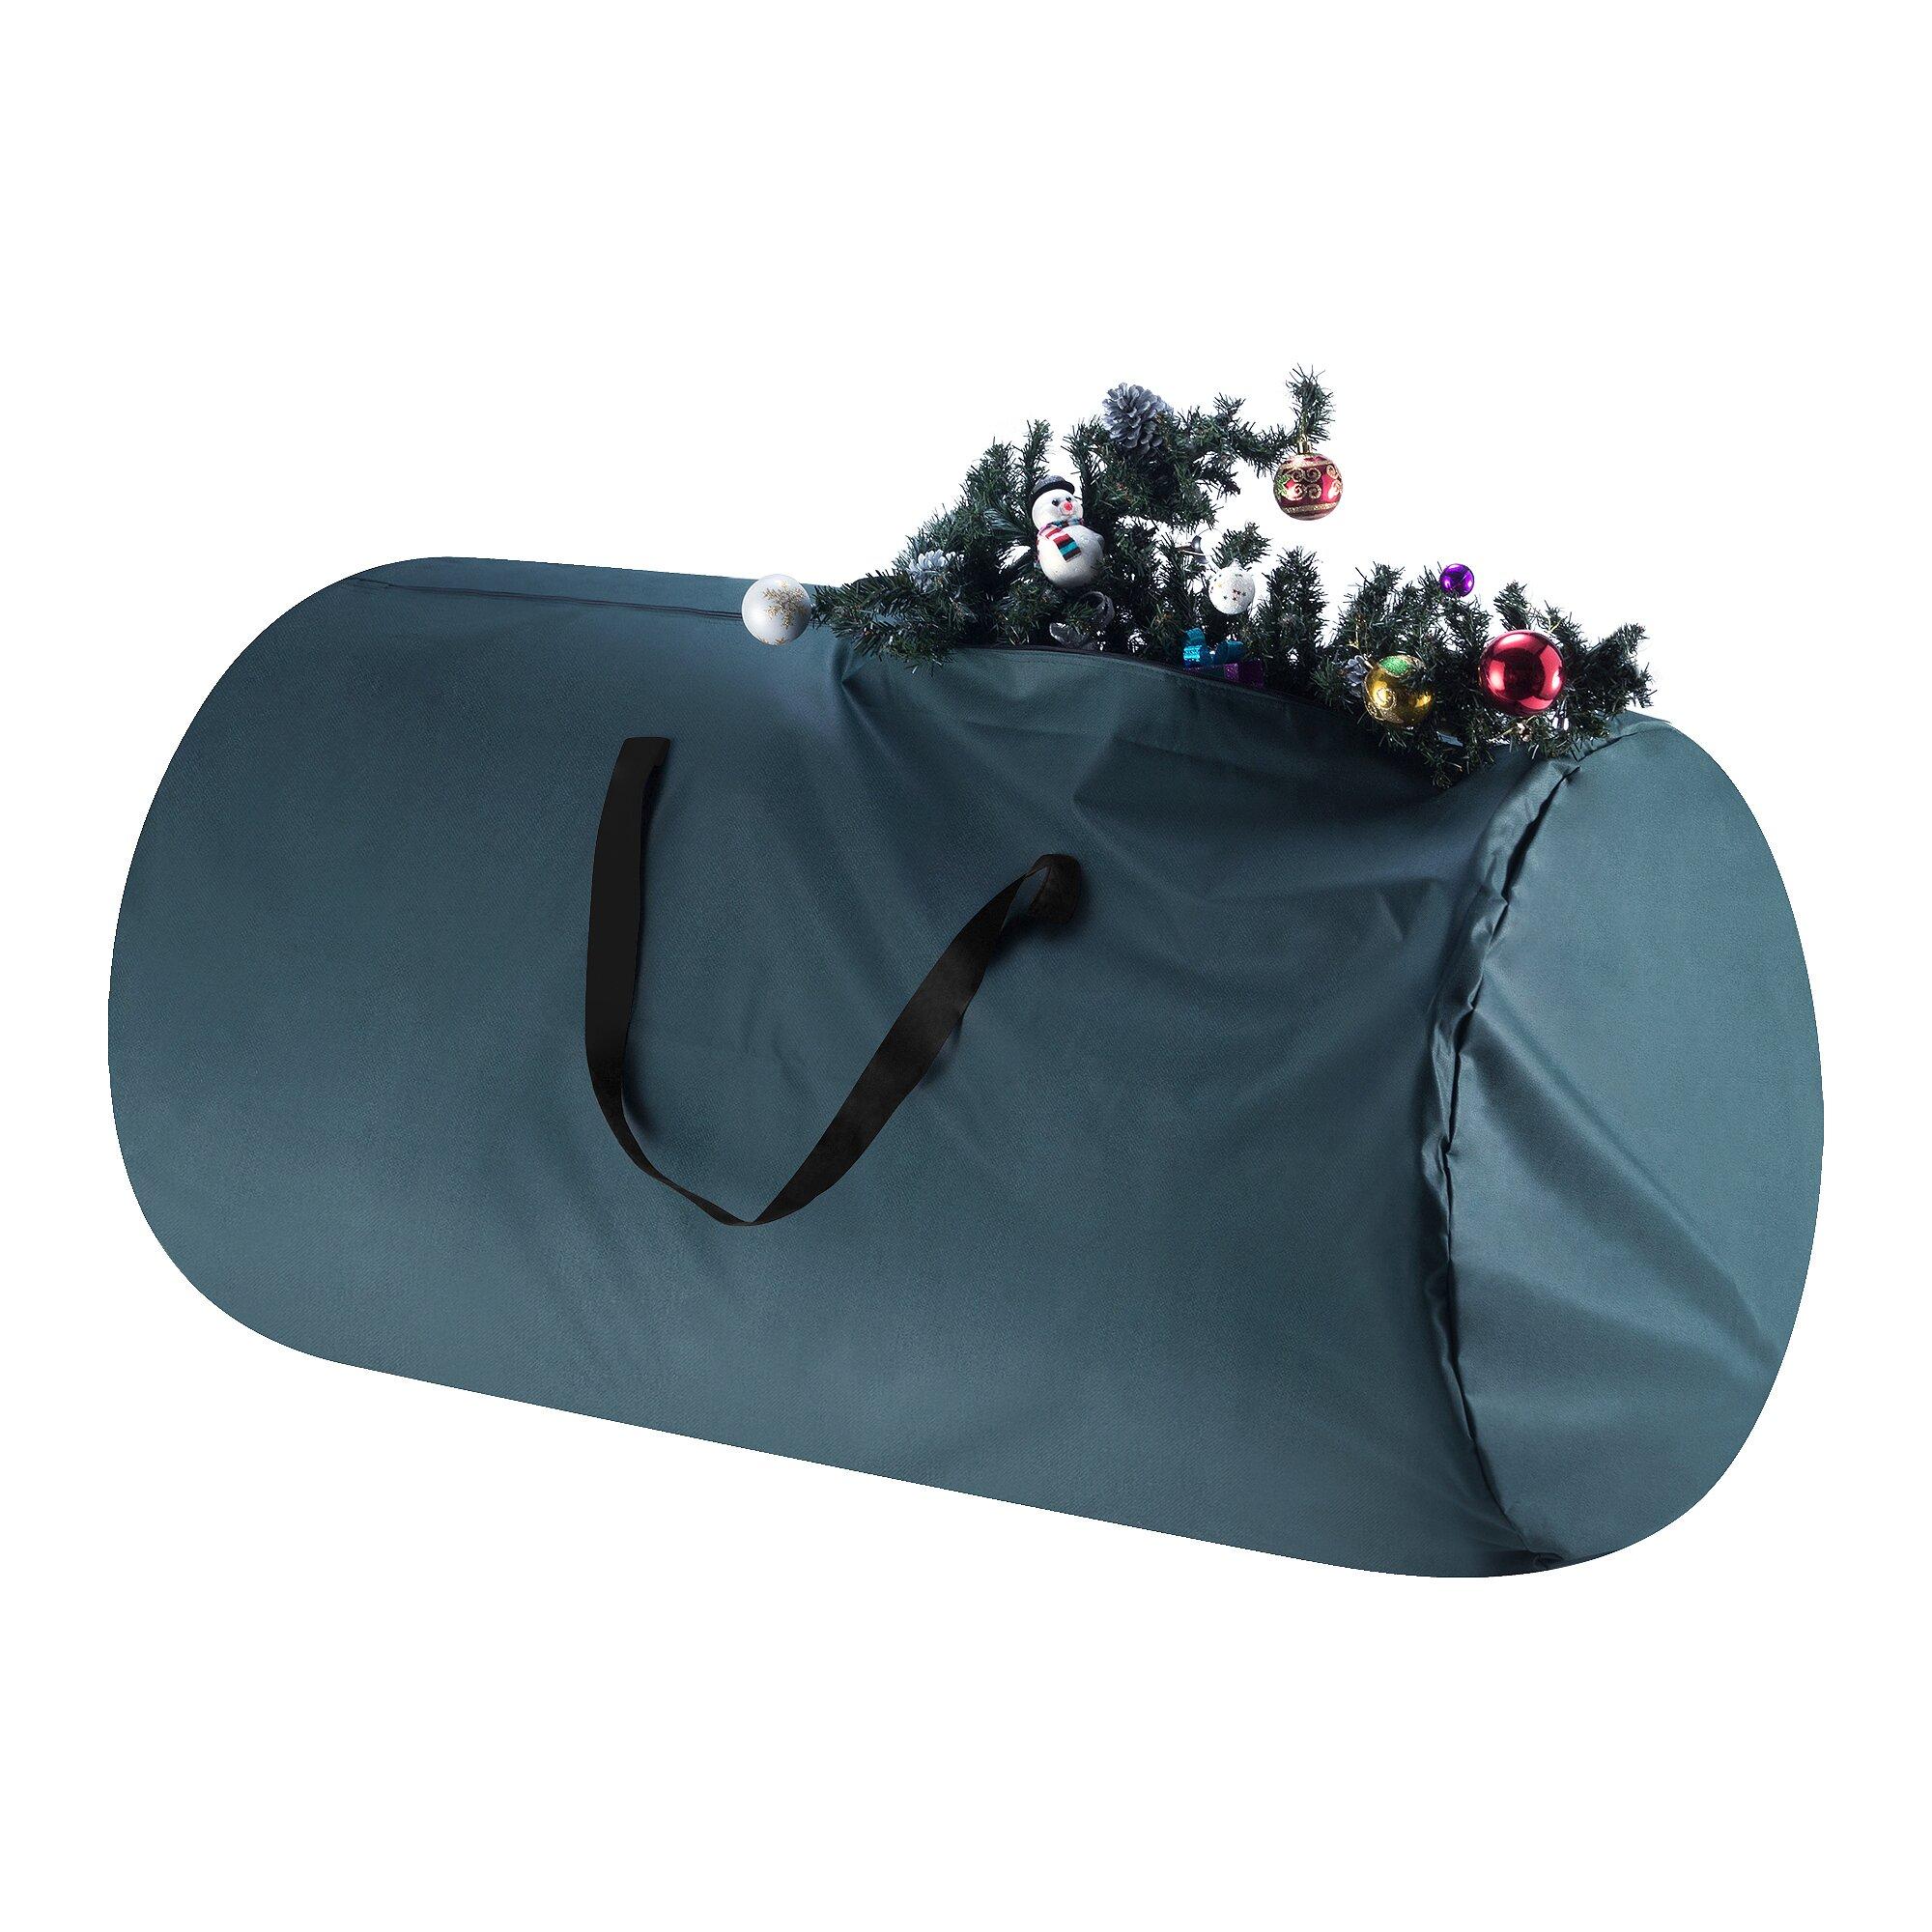 Storage bags for christmas trees - Elf Stor Canvas Christmas Tree Storage Bag